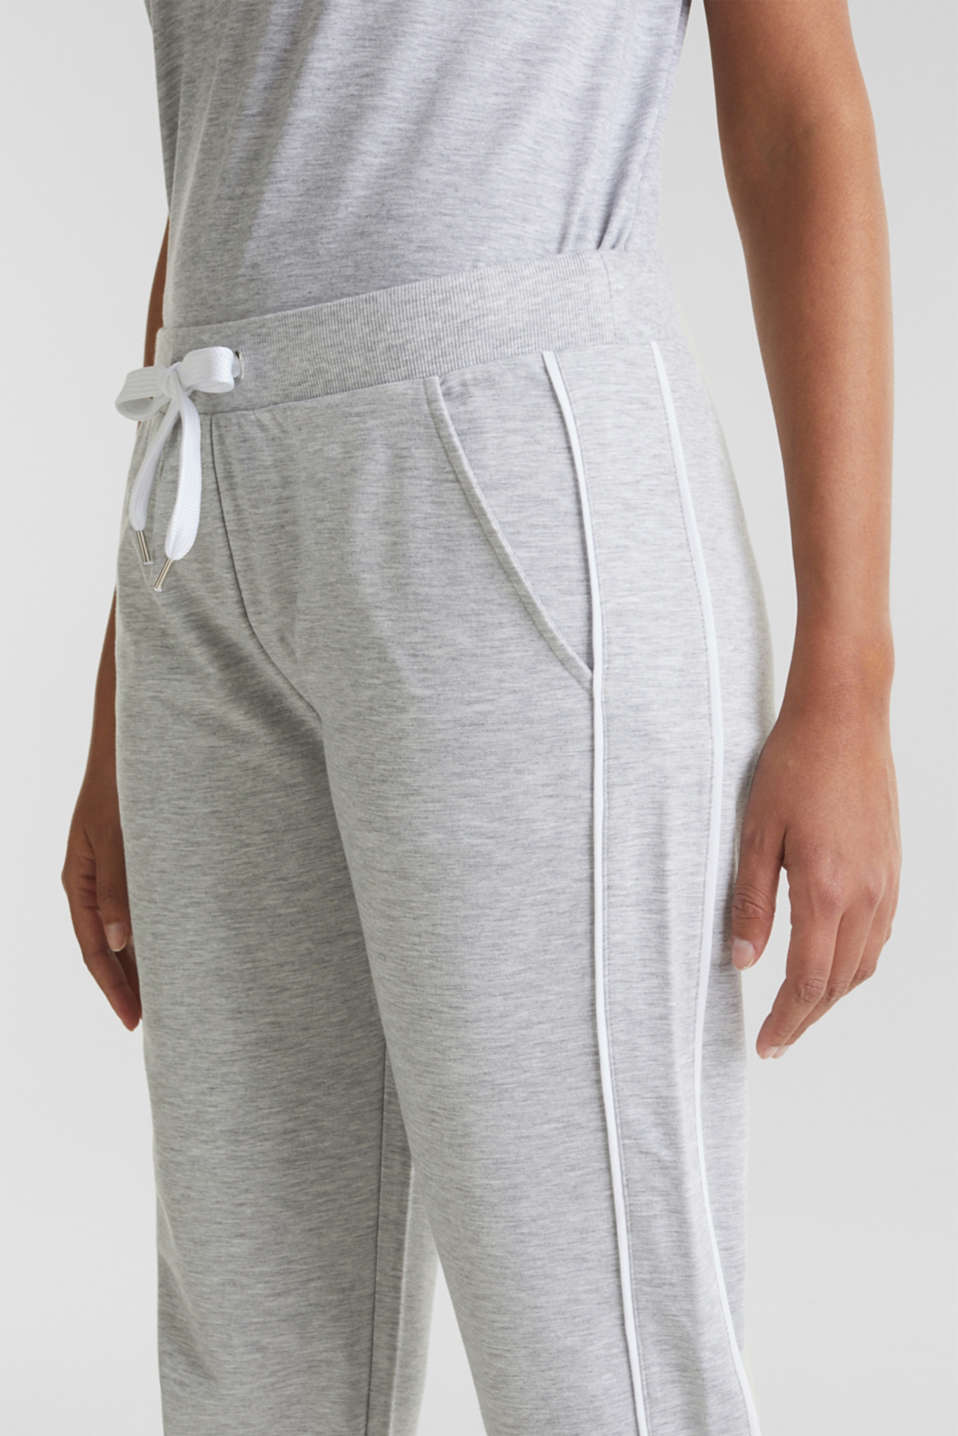 Melange stretch jersey trousers, MEDIUM GREY, detail image number 2